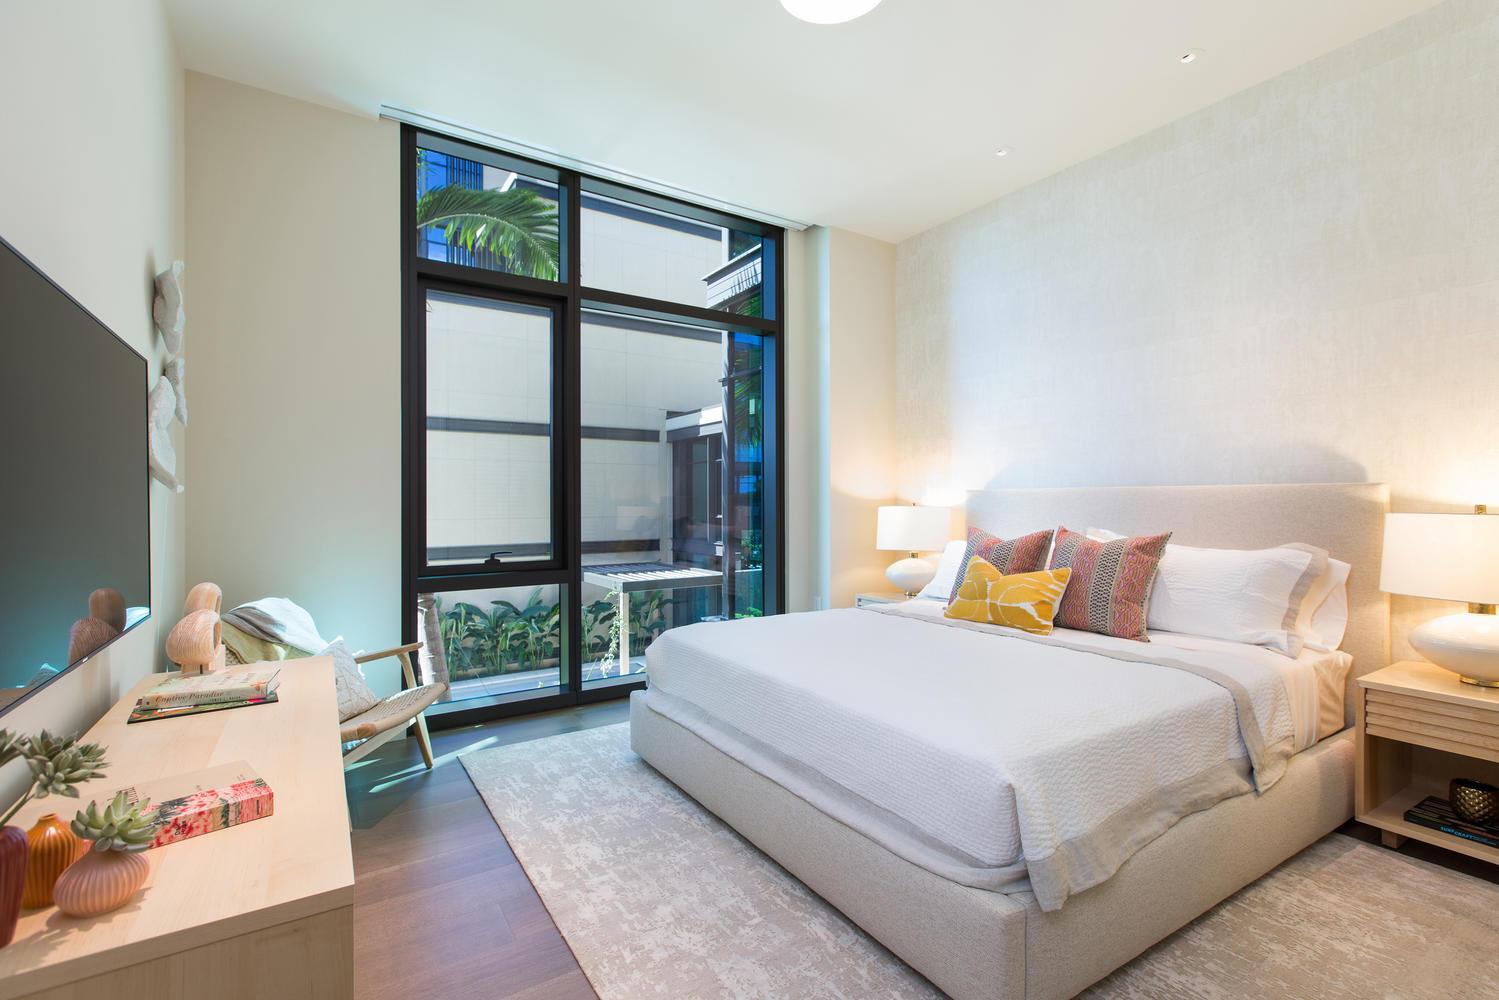 1388 Ala Moana Blvd 7401-large-022-31-Bedroom Suite 3-1500x1000-72dpi.jpg